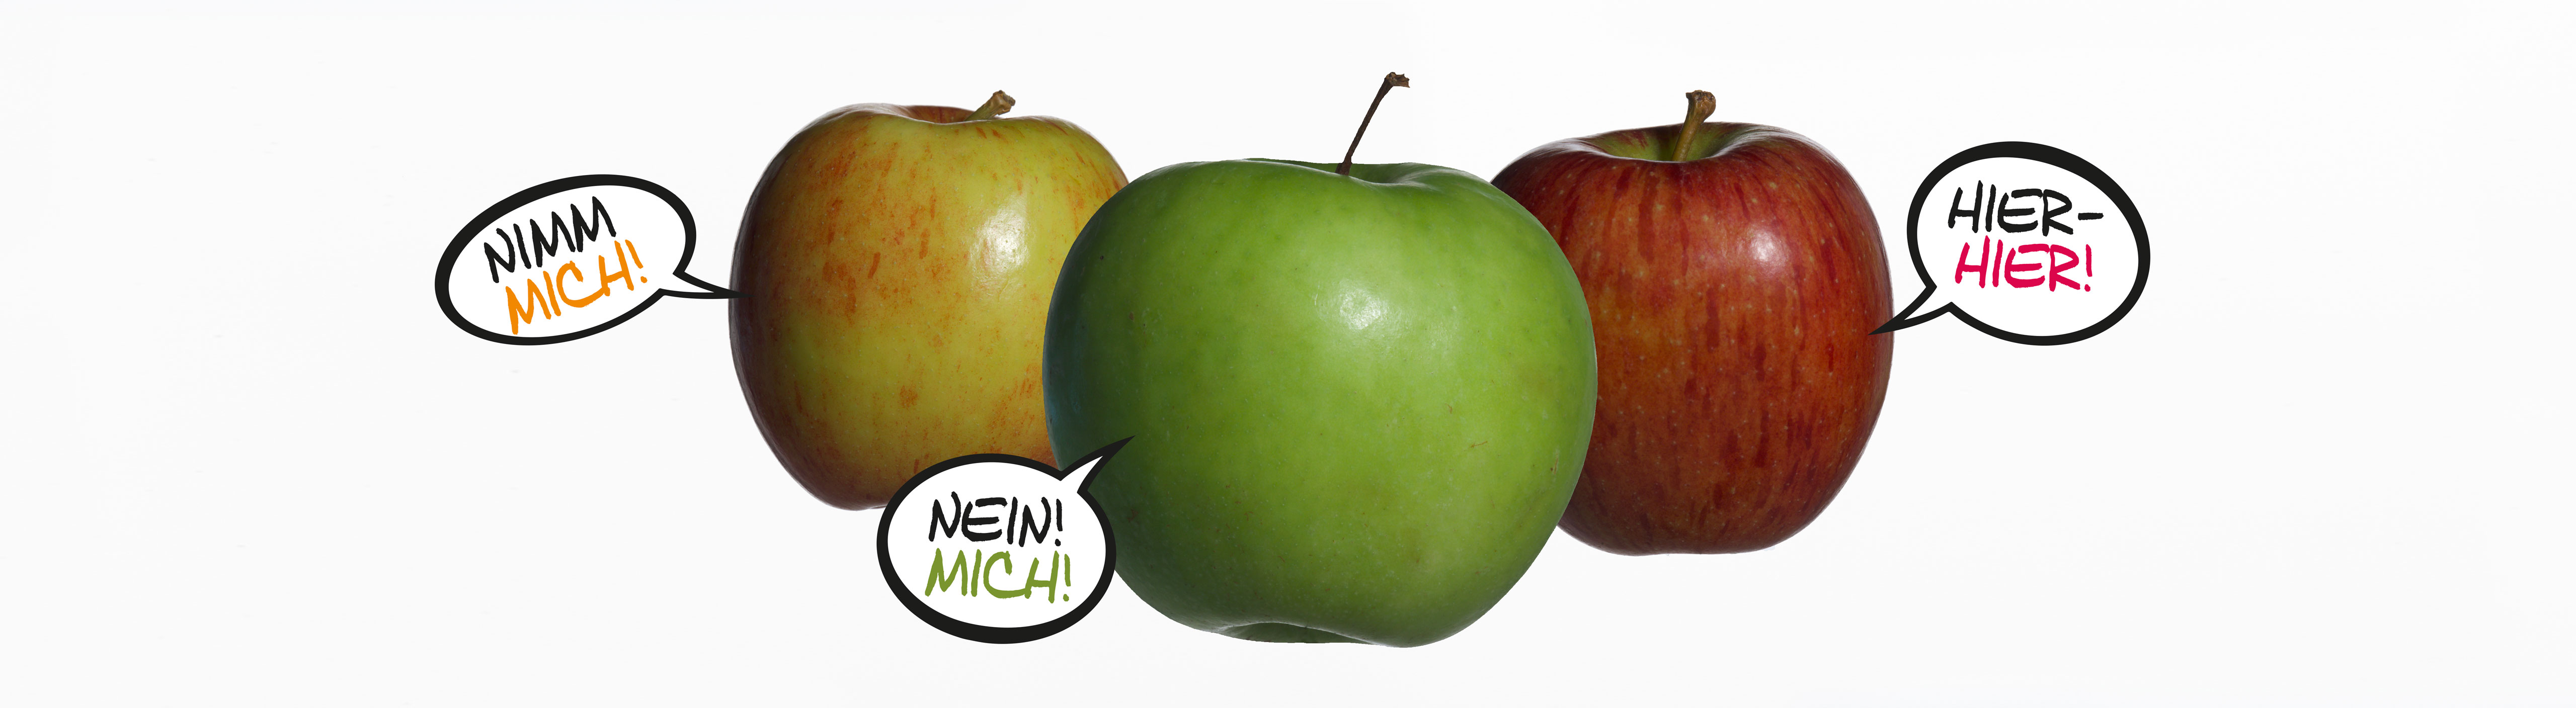 Kaufberatung Apple Macintosh